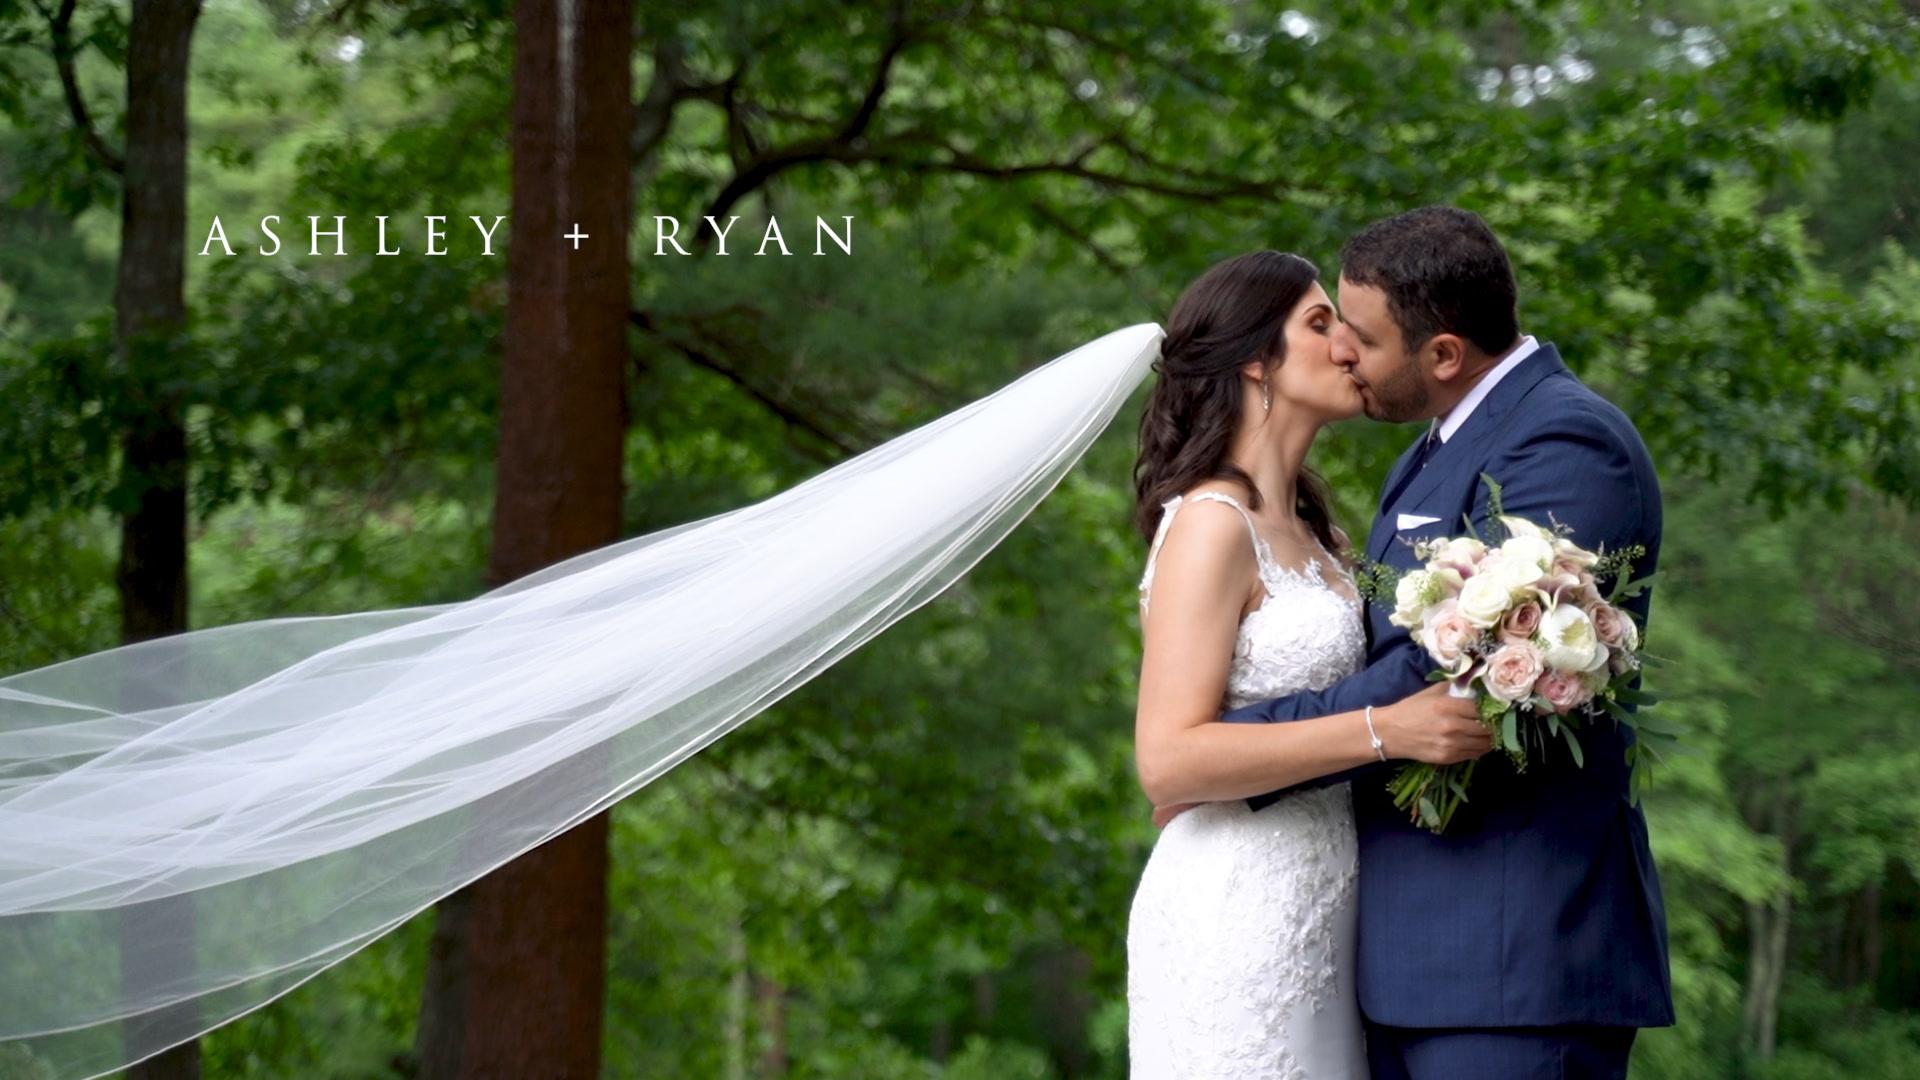 Ashley + Ryan | Foxborough, Massachusetts | Lakeview Pavilion